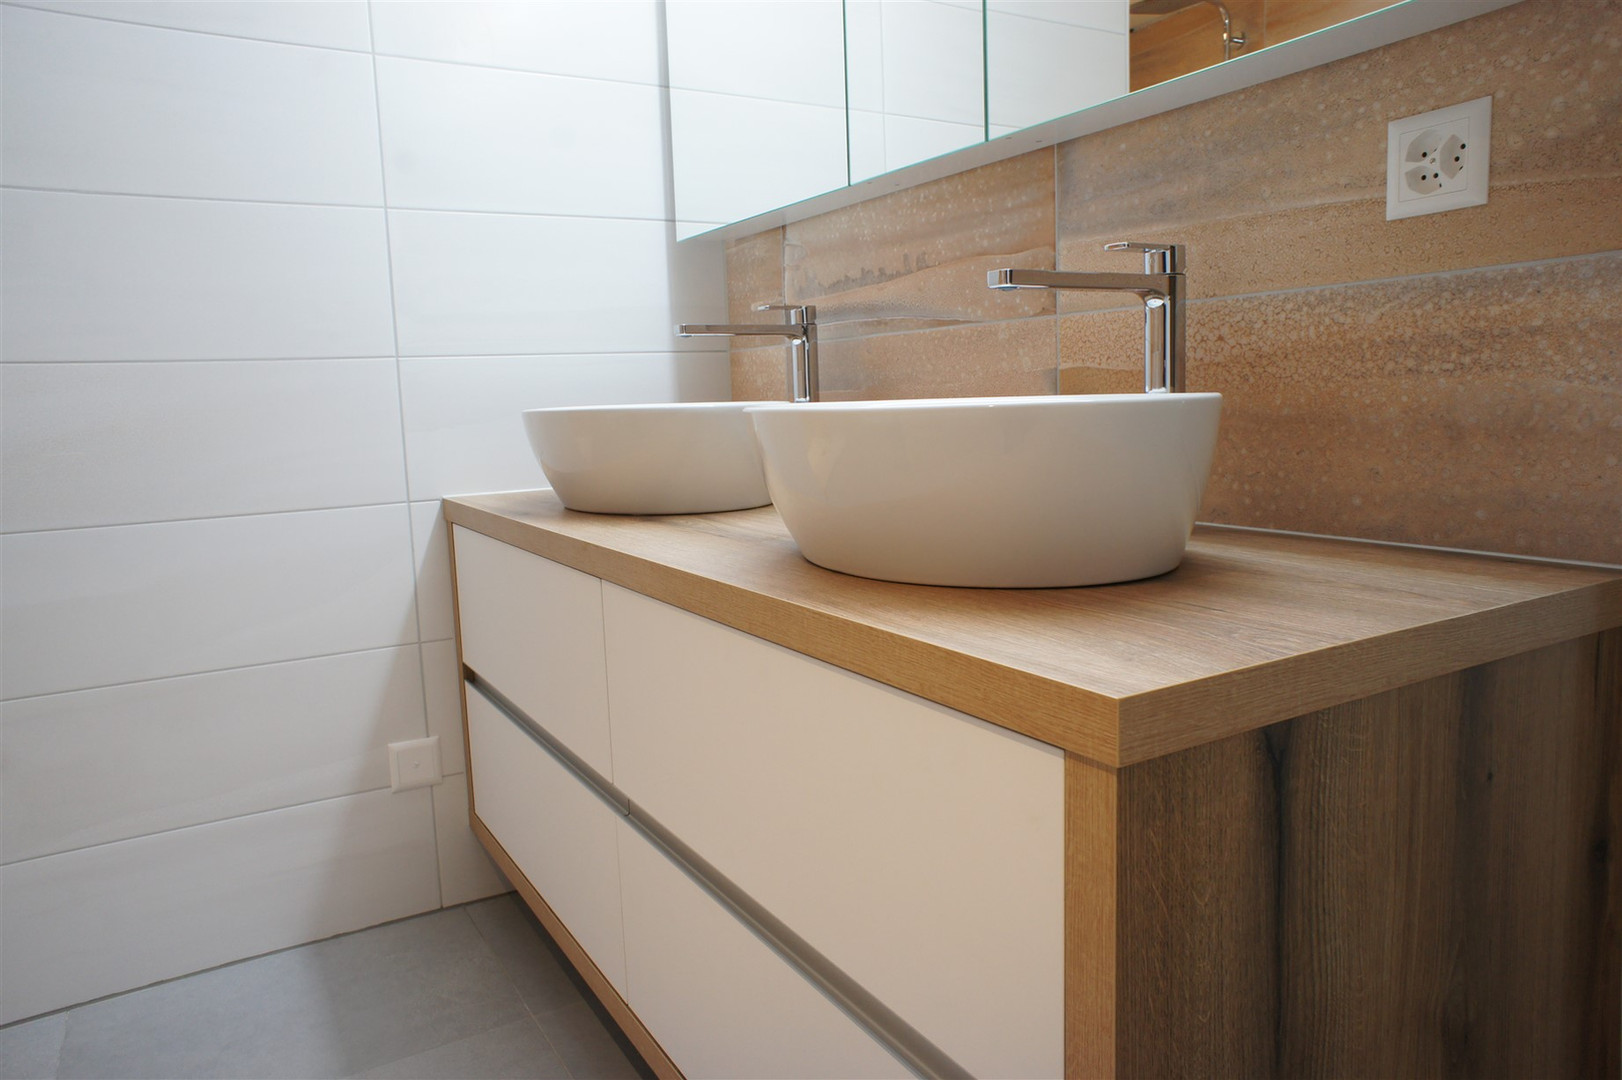 Meuble-salle-de-bain.jpg